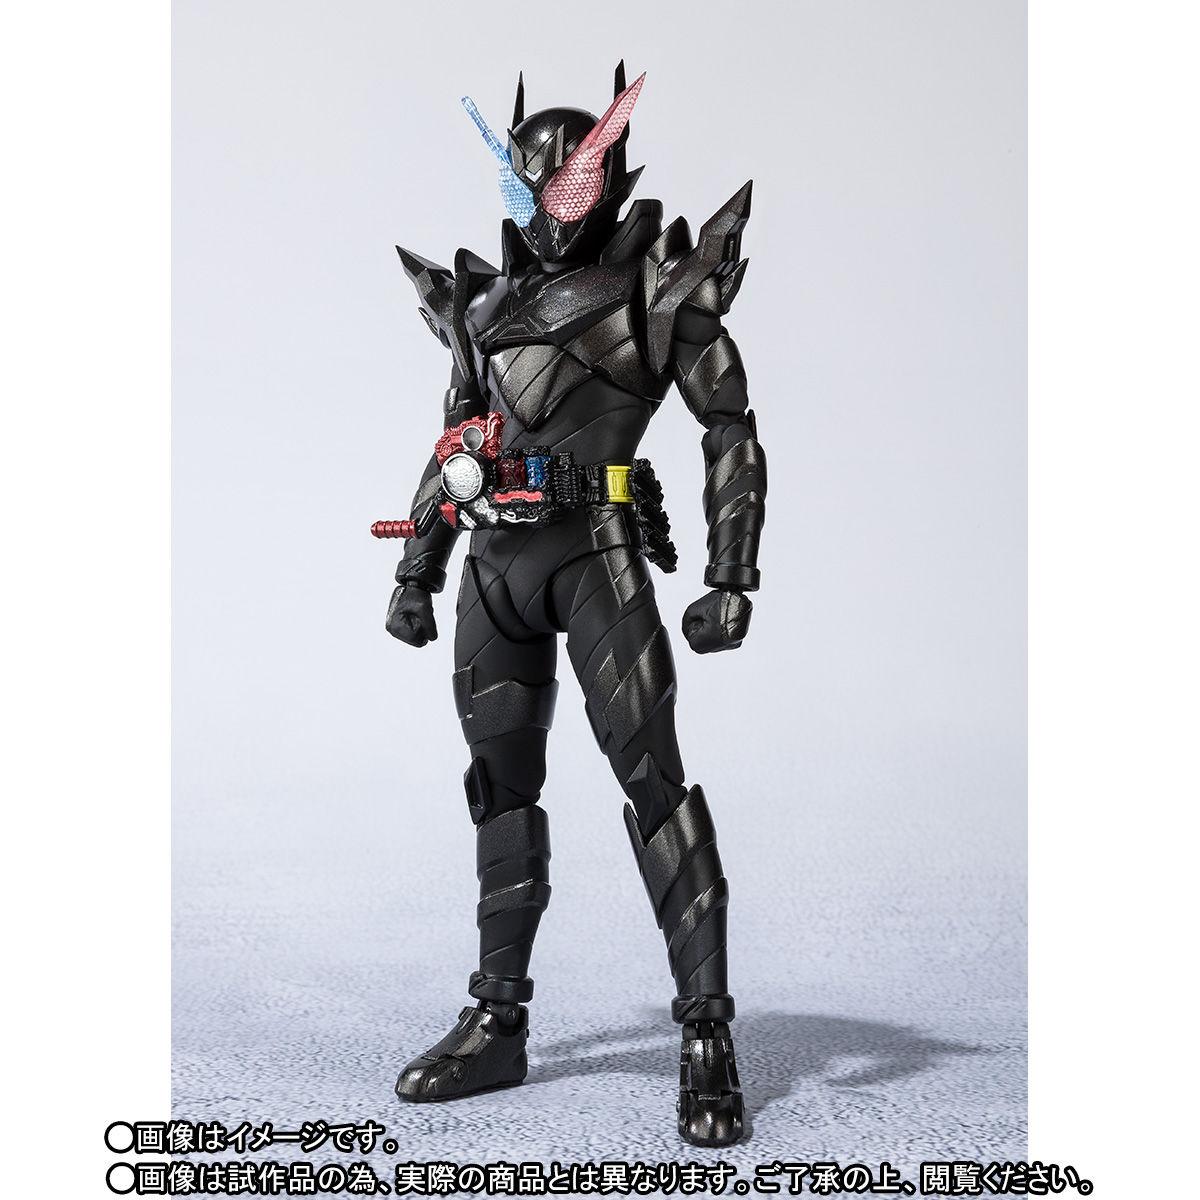 ROBOT魂 〈SIDE MS〉『RX-78-2 ガンダム & Gファイター ver. A.N.I.M.E.~リアルタイプカラー~』可動フィギュア-011